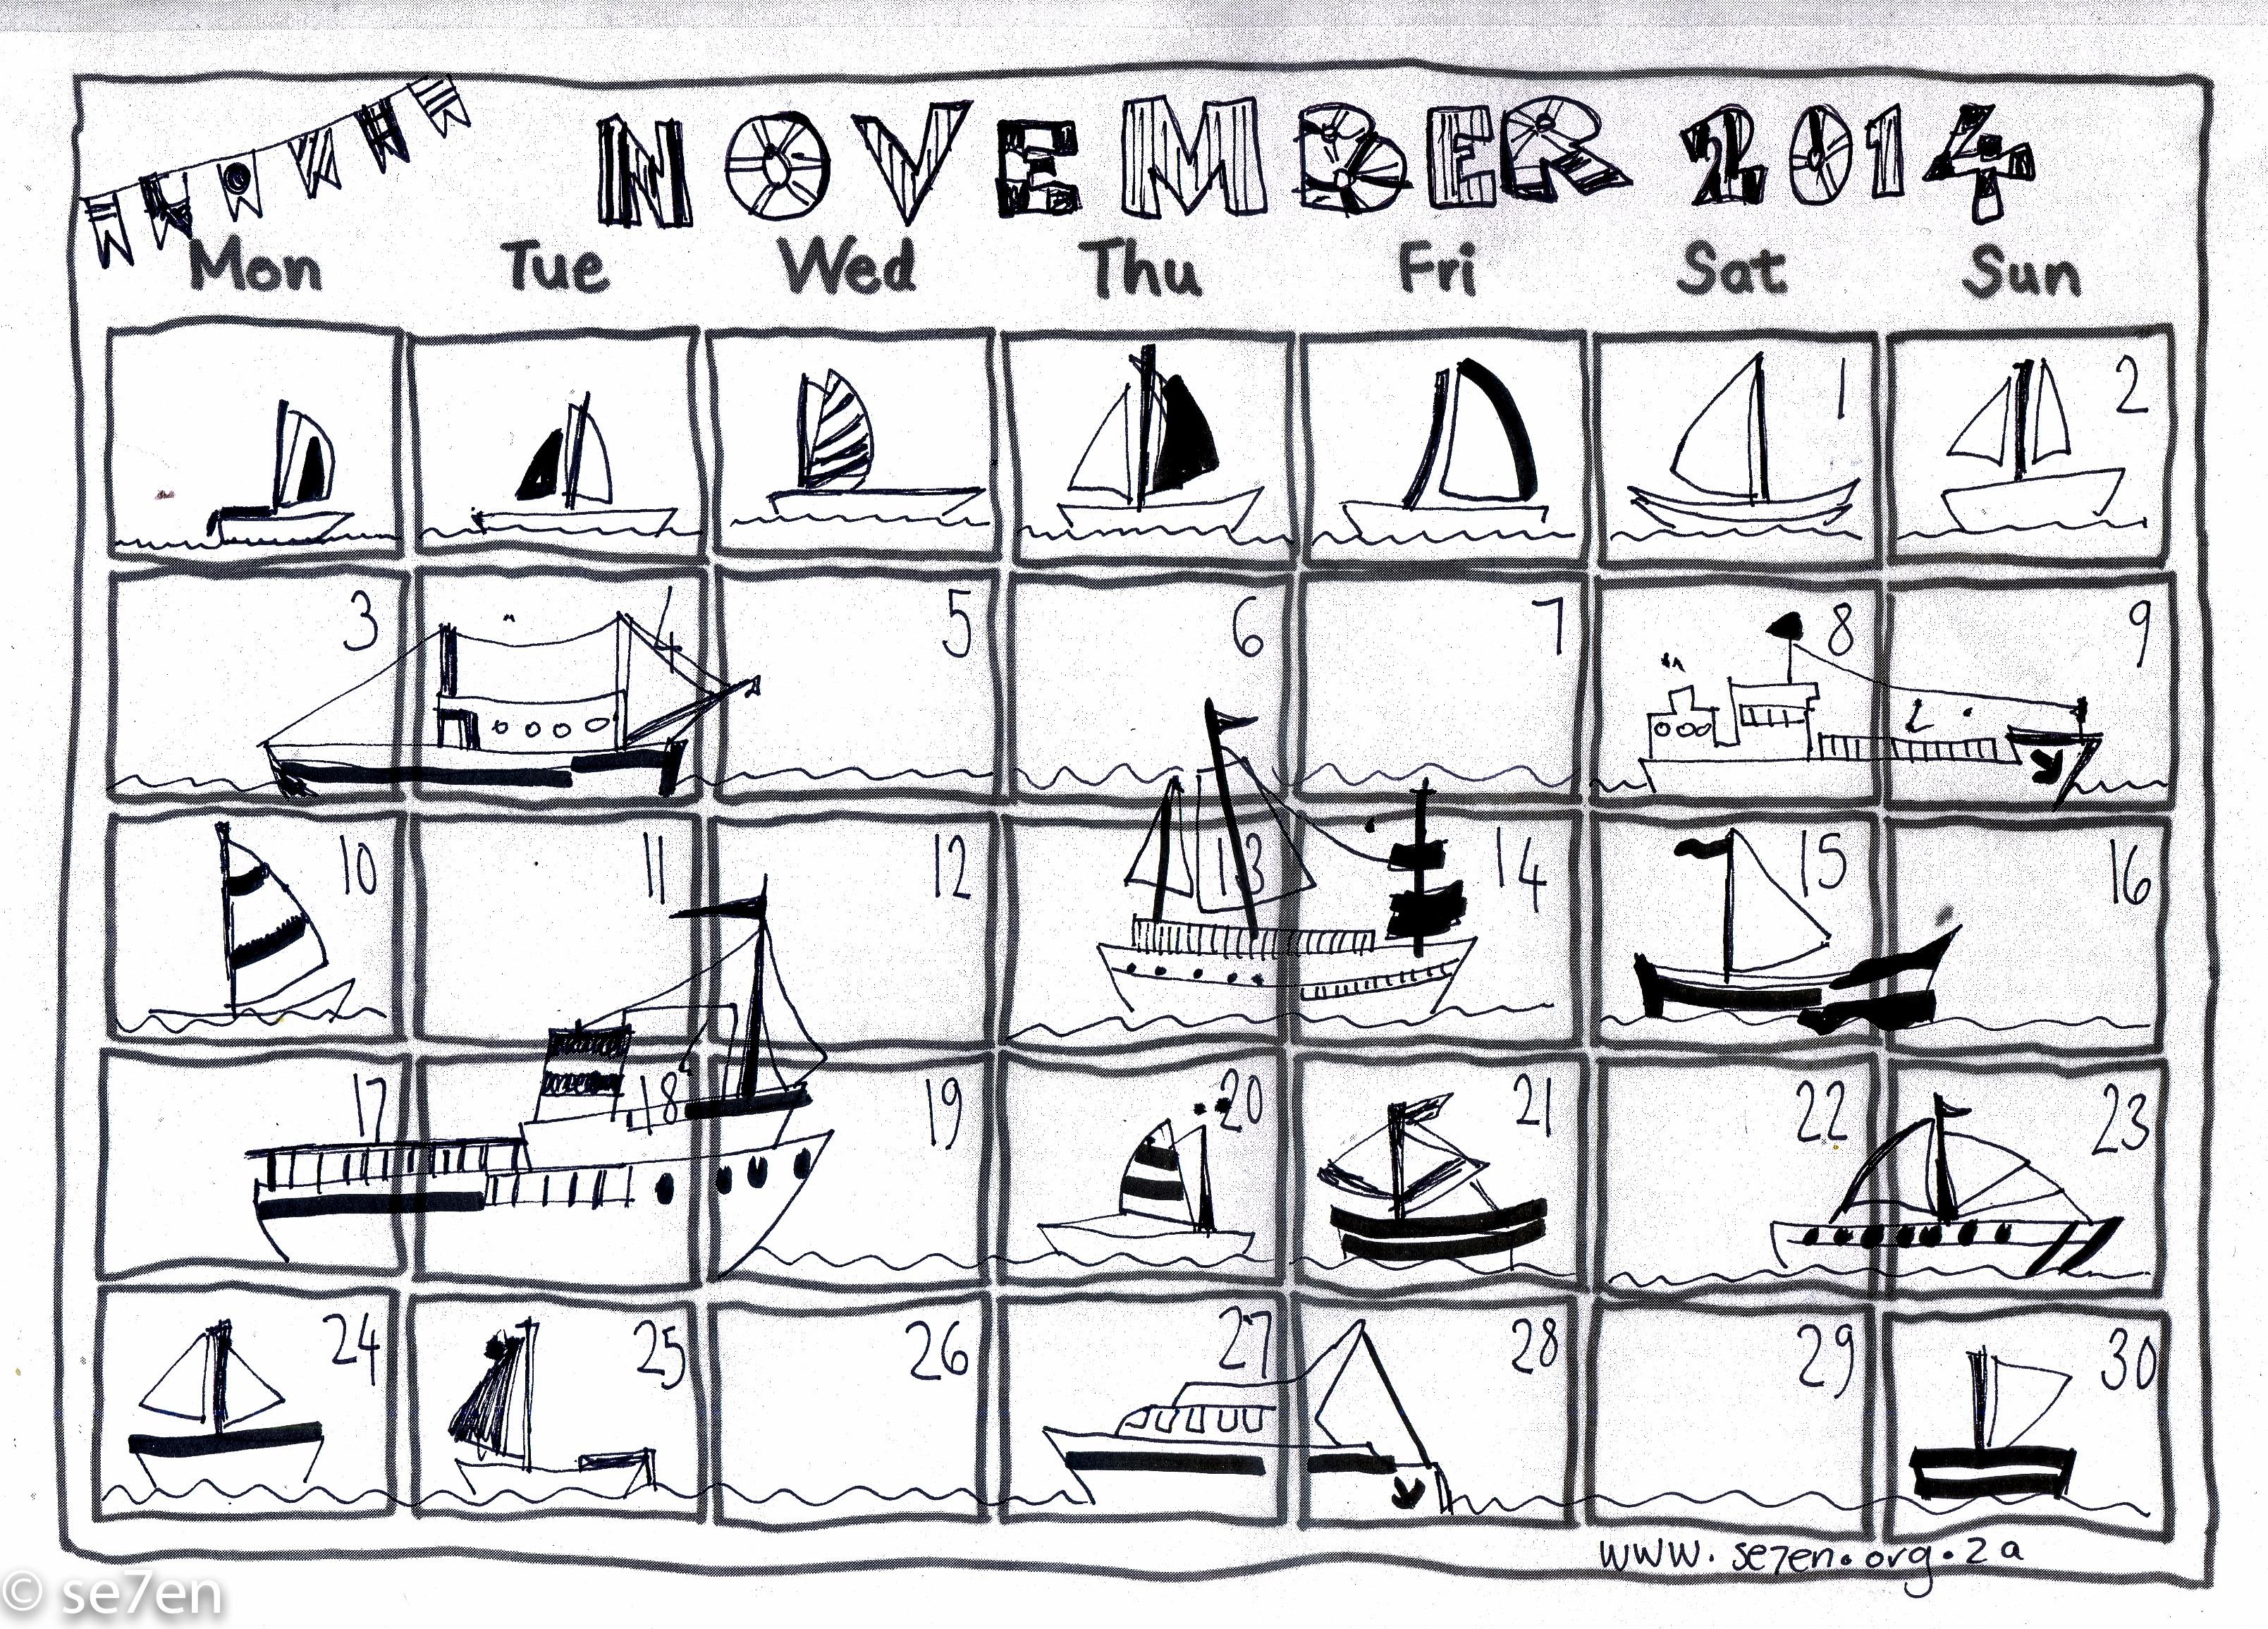 Se7en S November And Your Free Printable Calendar Se7en